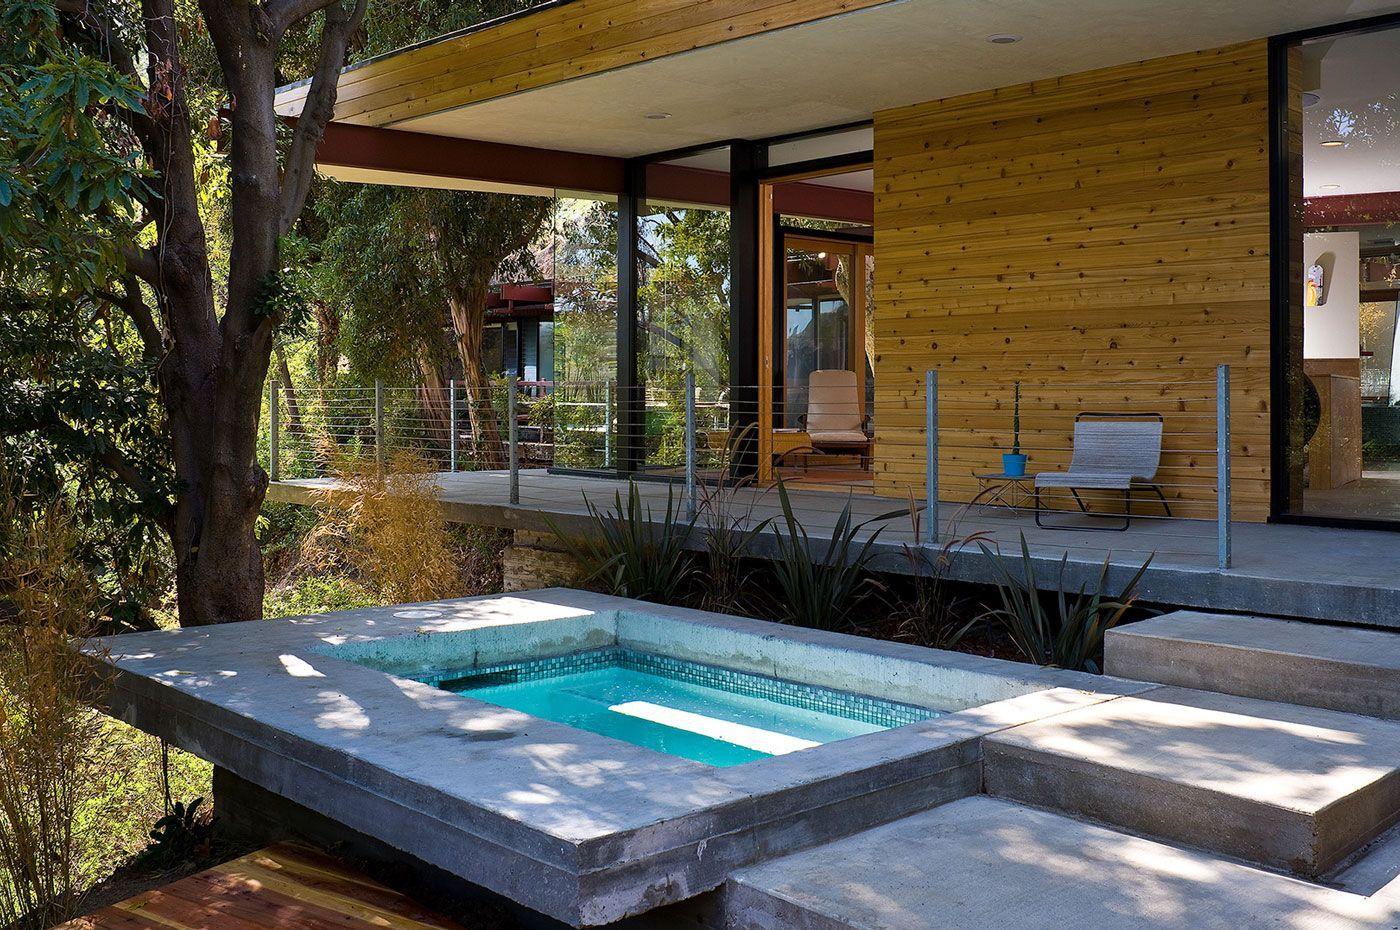 small pool on the terrace - Cerca con Google